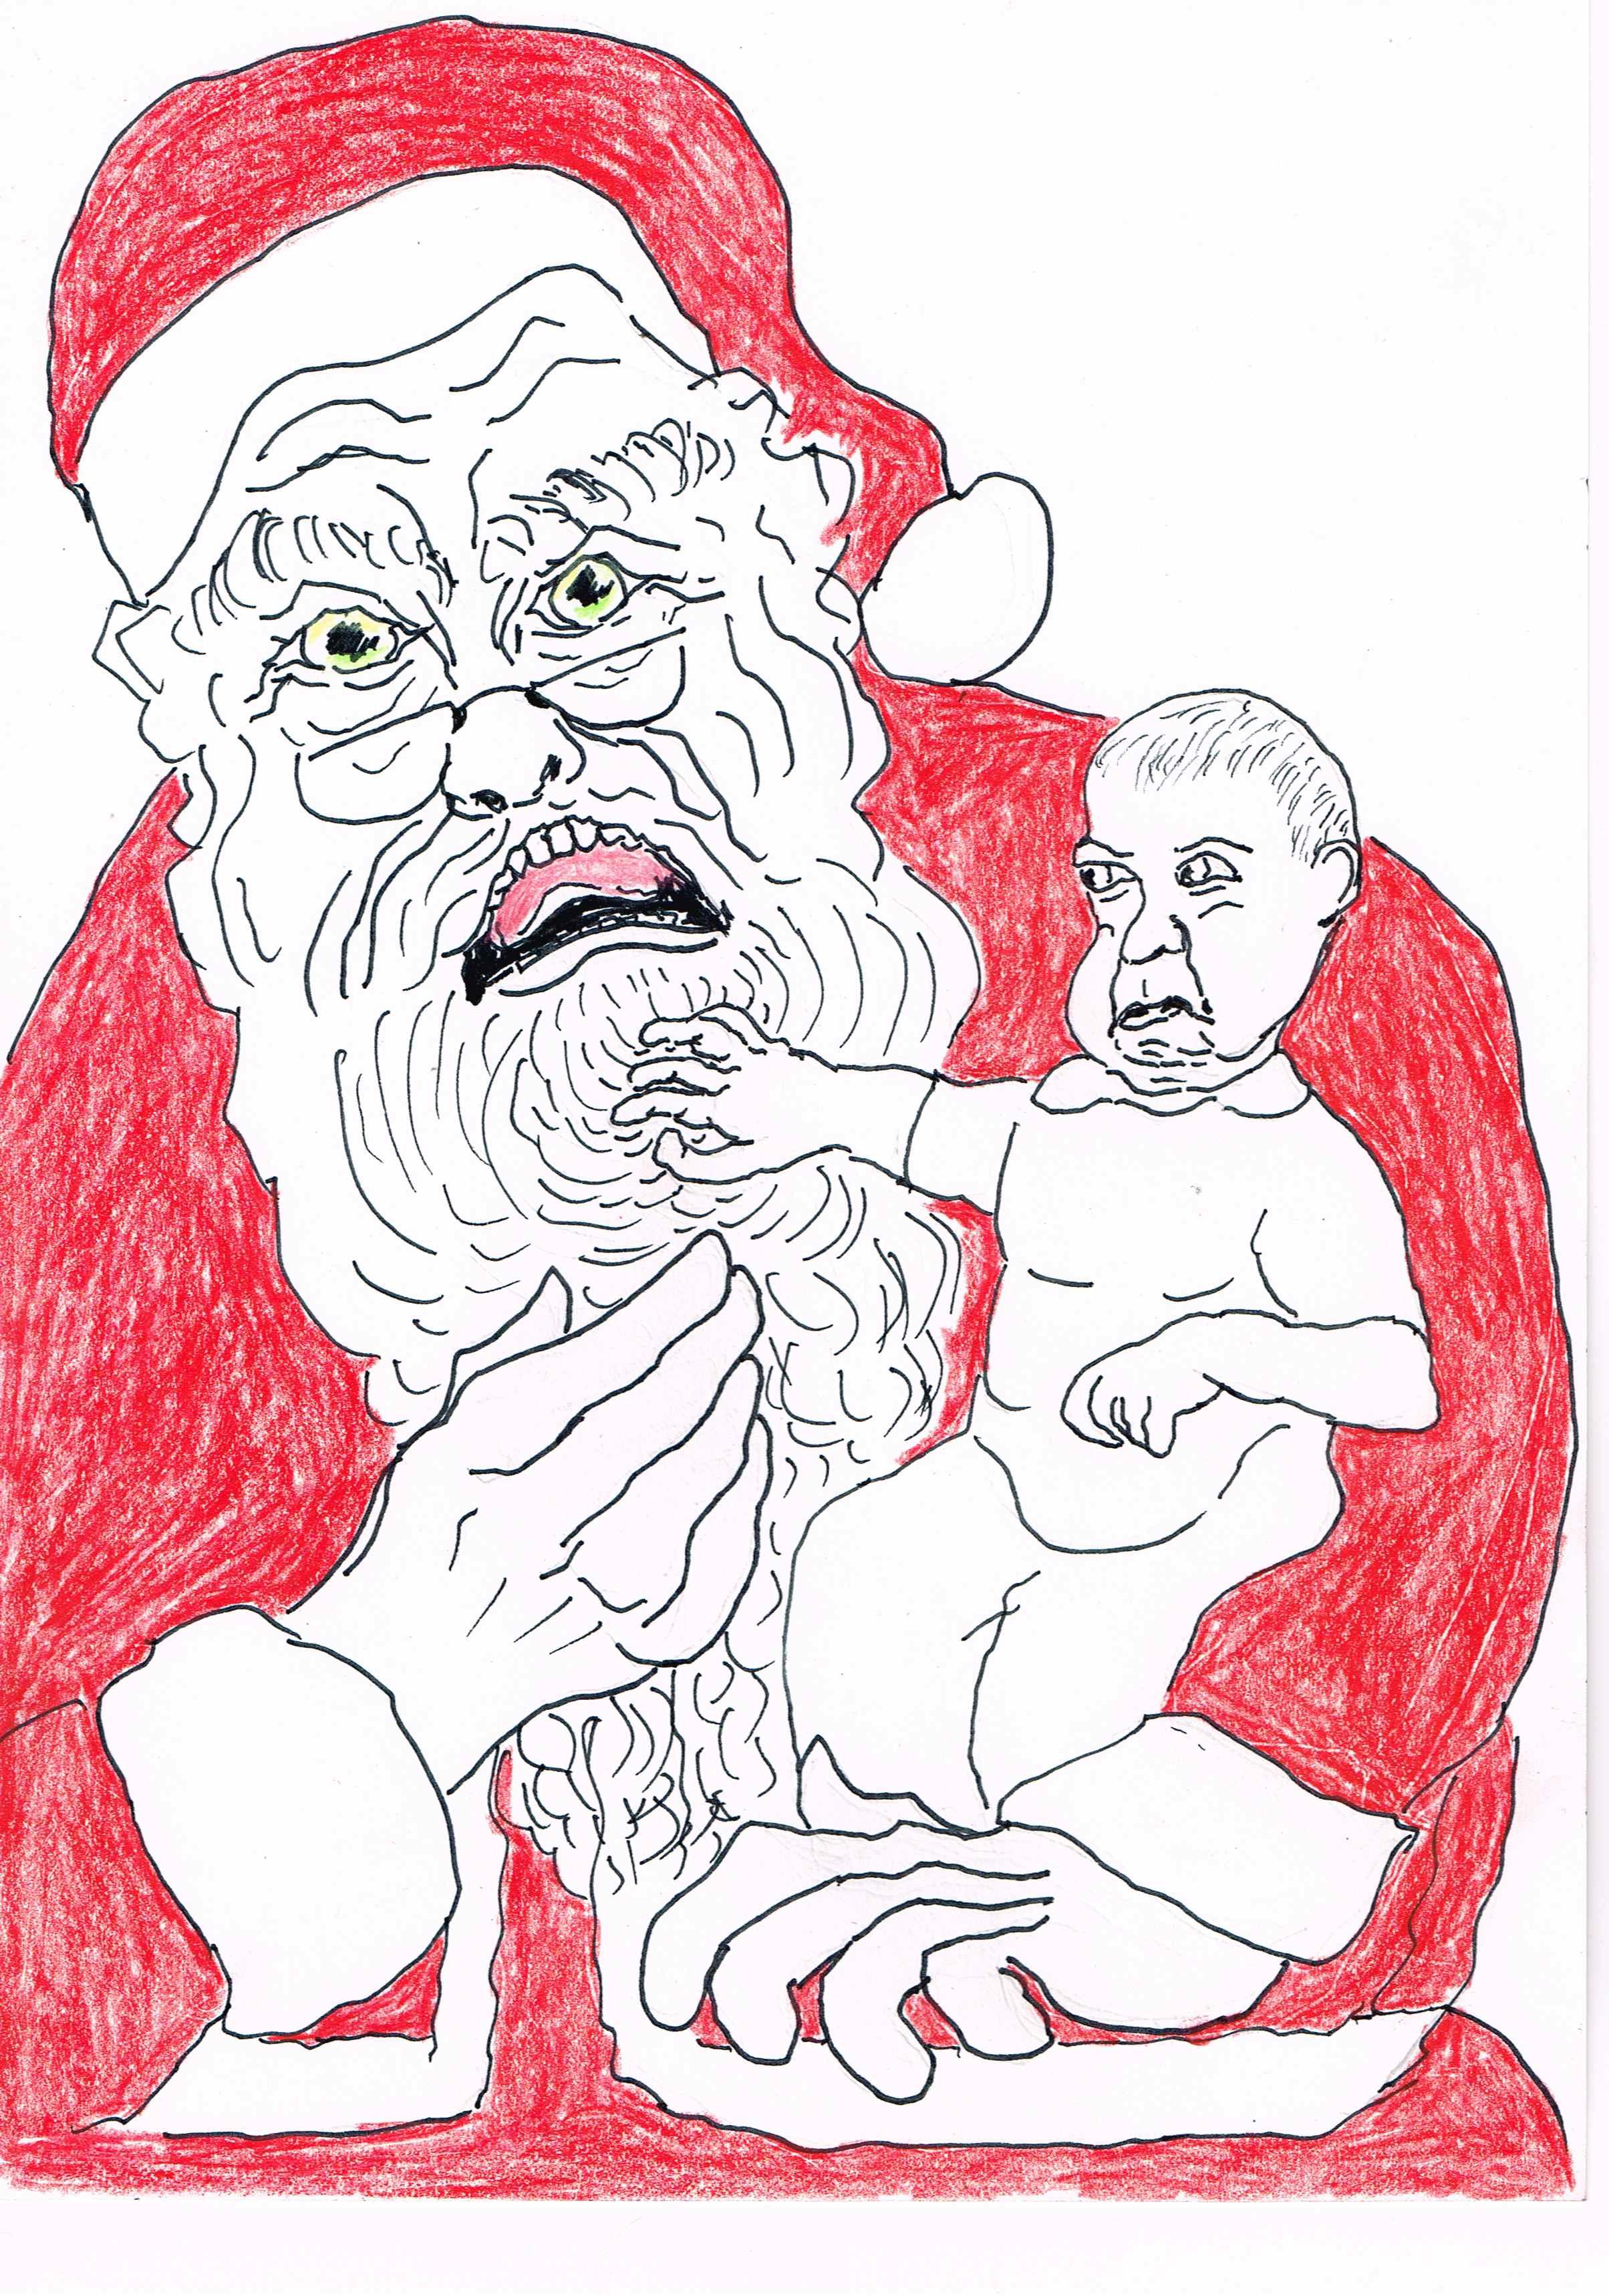 Santa's with real beards get paid 50% more than Santa's with fake beards.